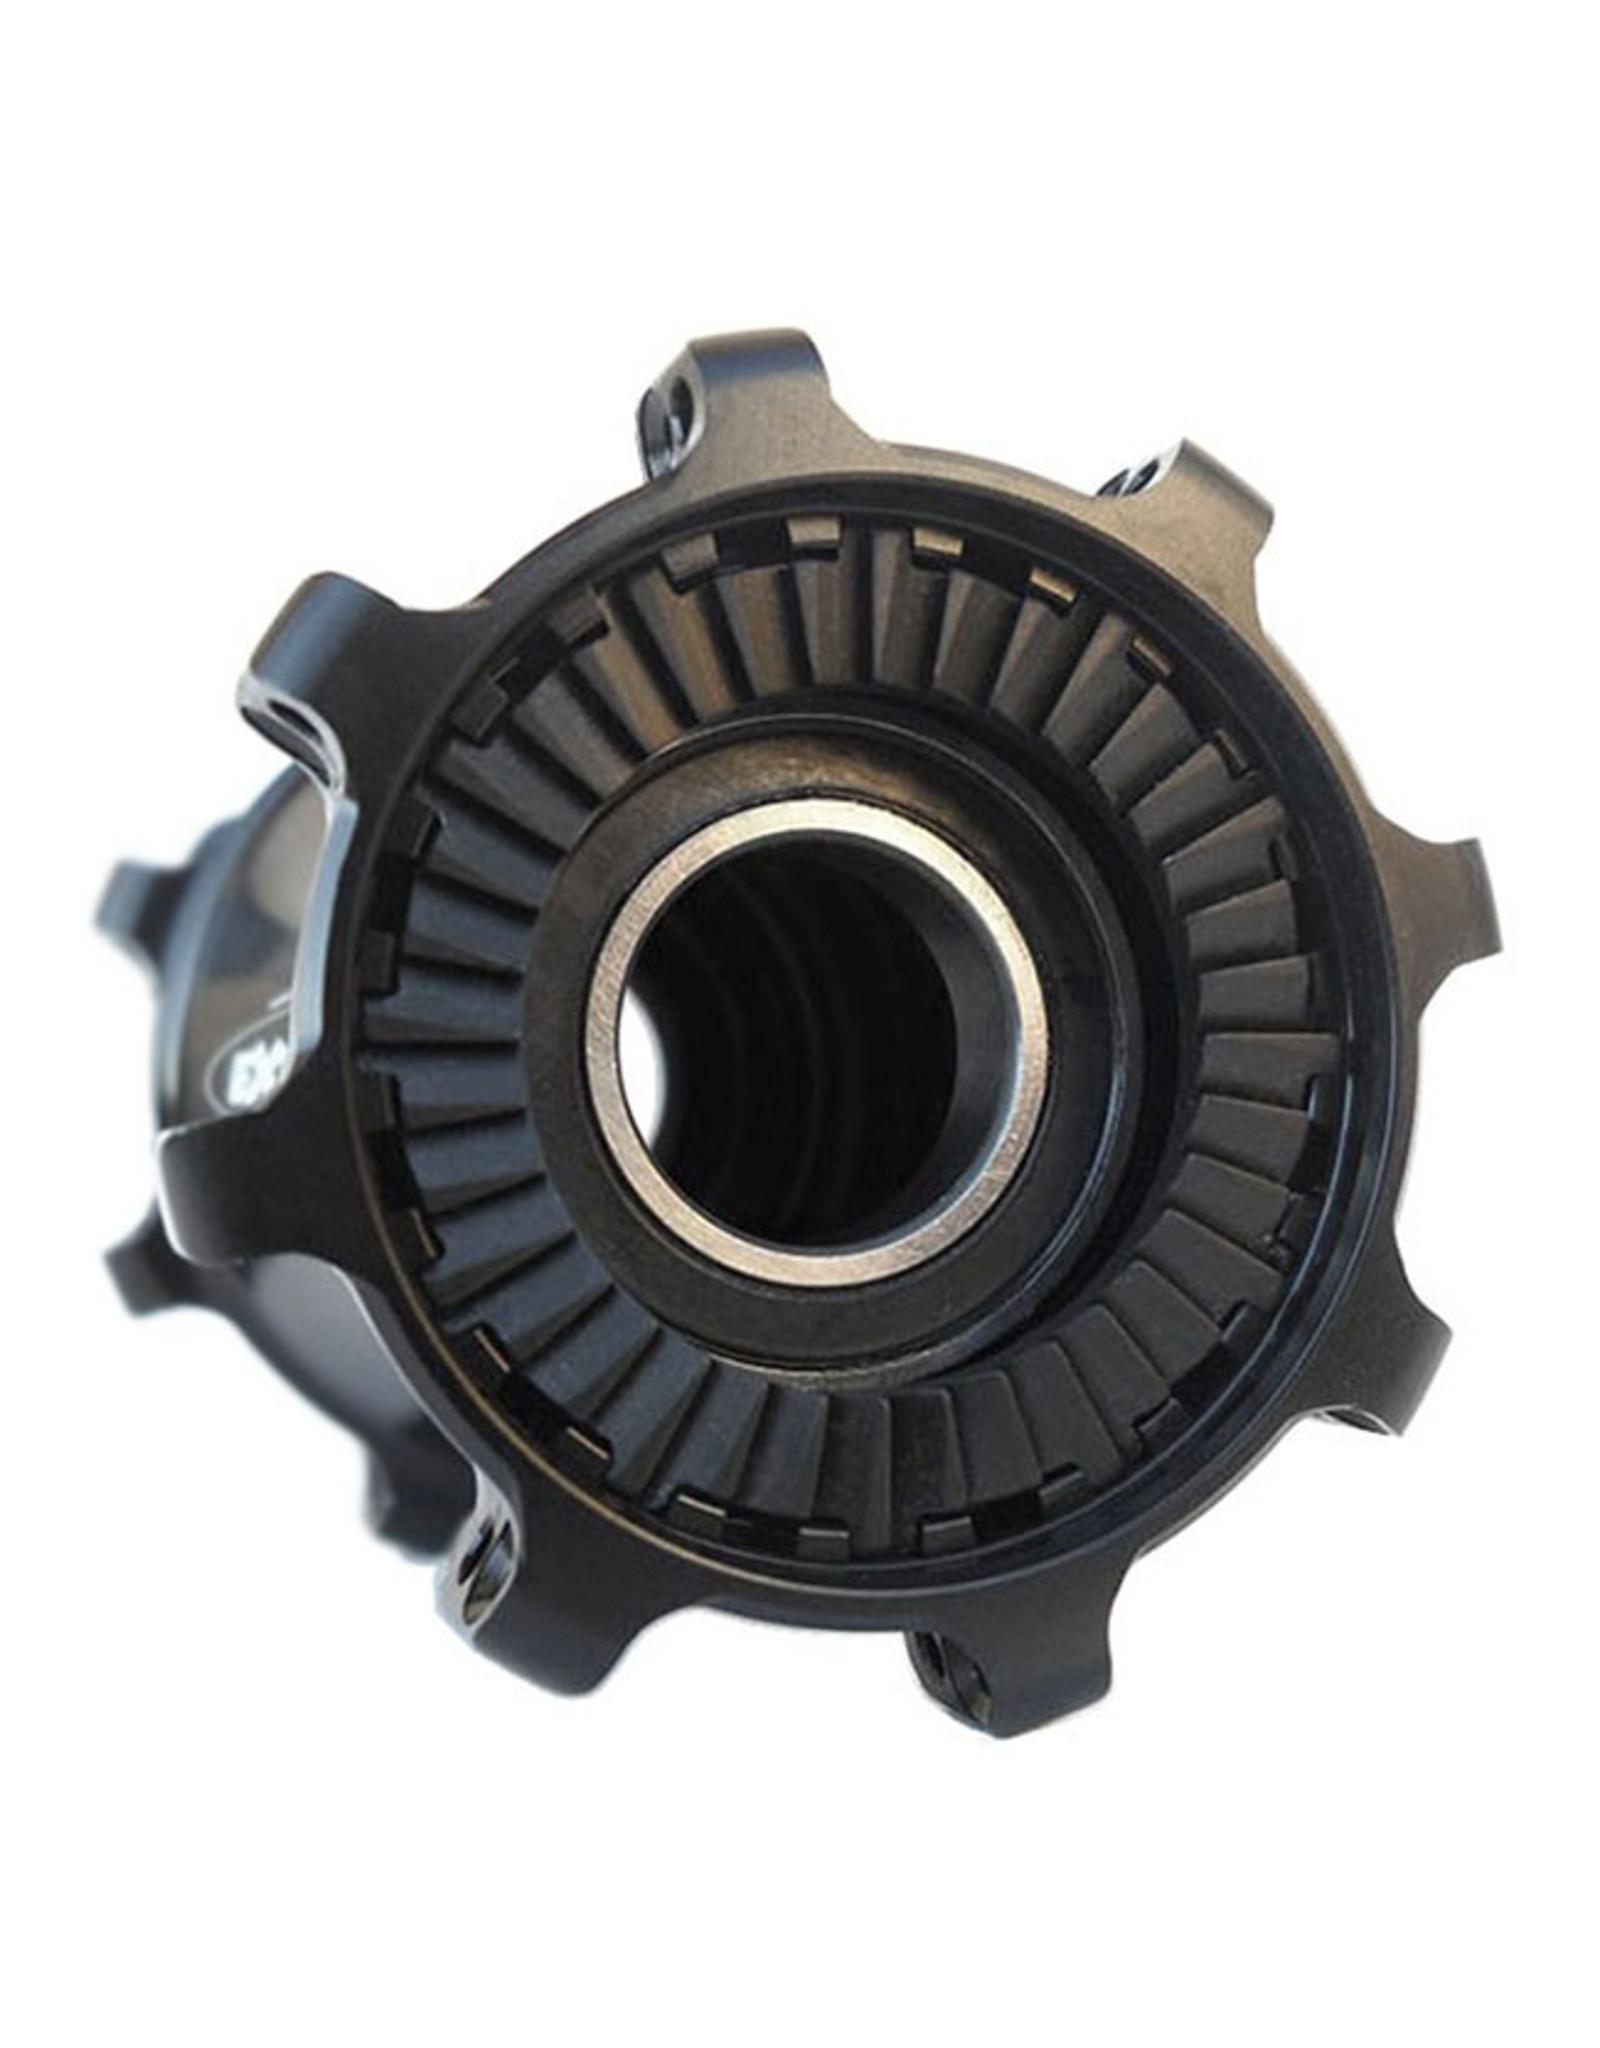 Extralite Extralite HyperBoost Disc Rear Hub